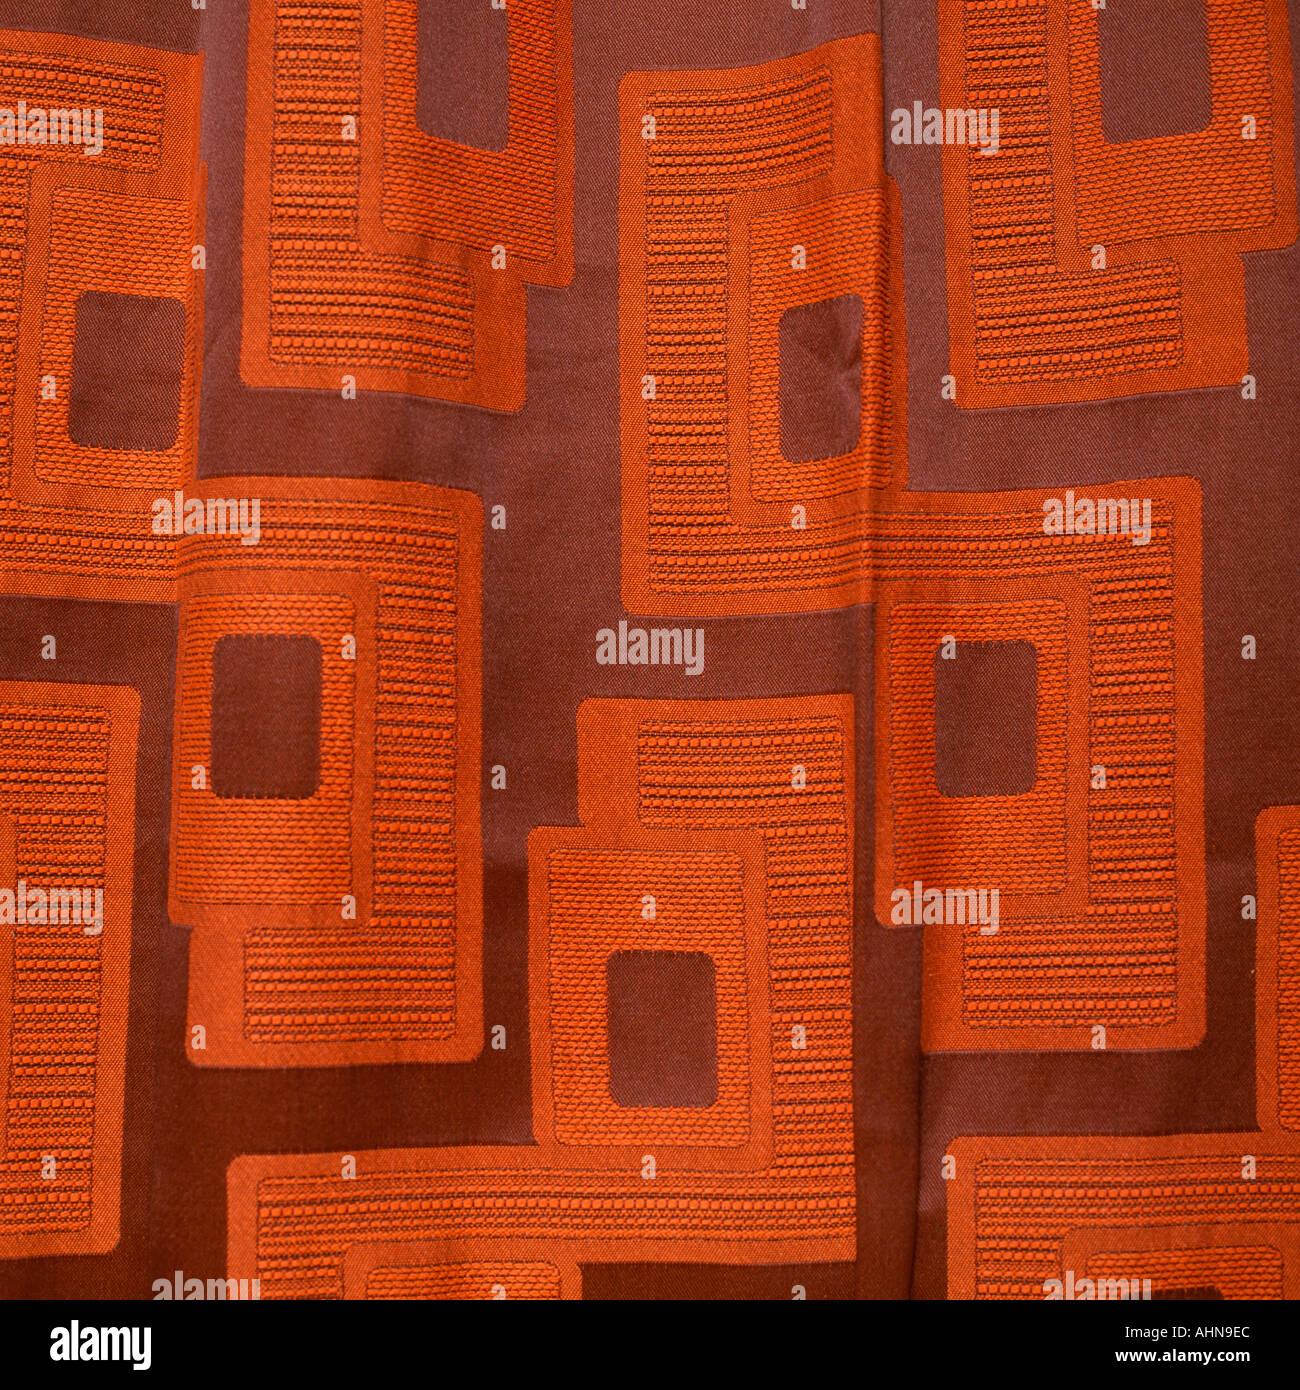 Retro-Muster Vorhänge Stockbild